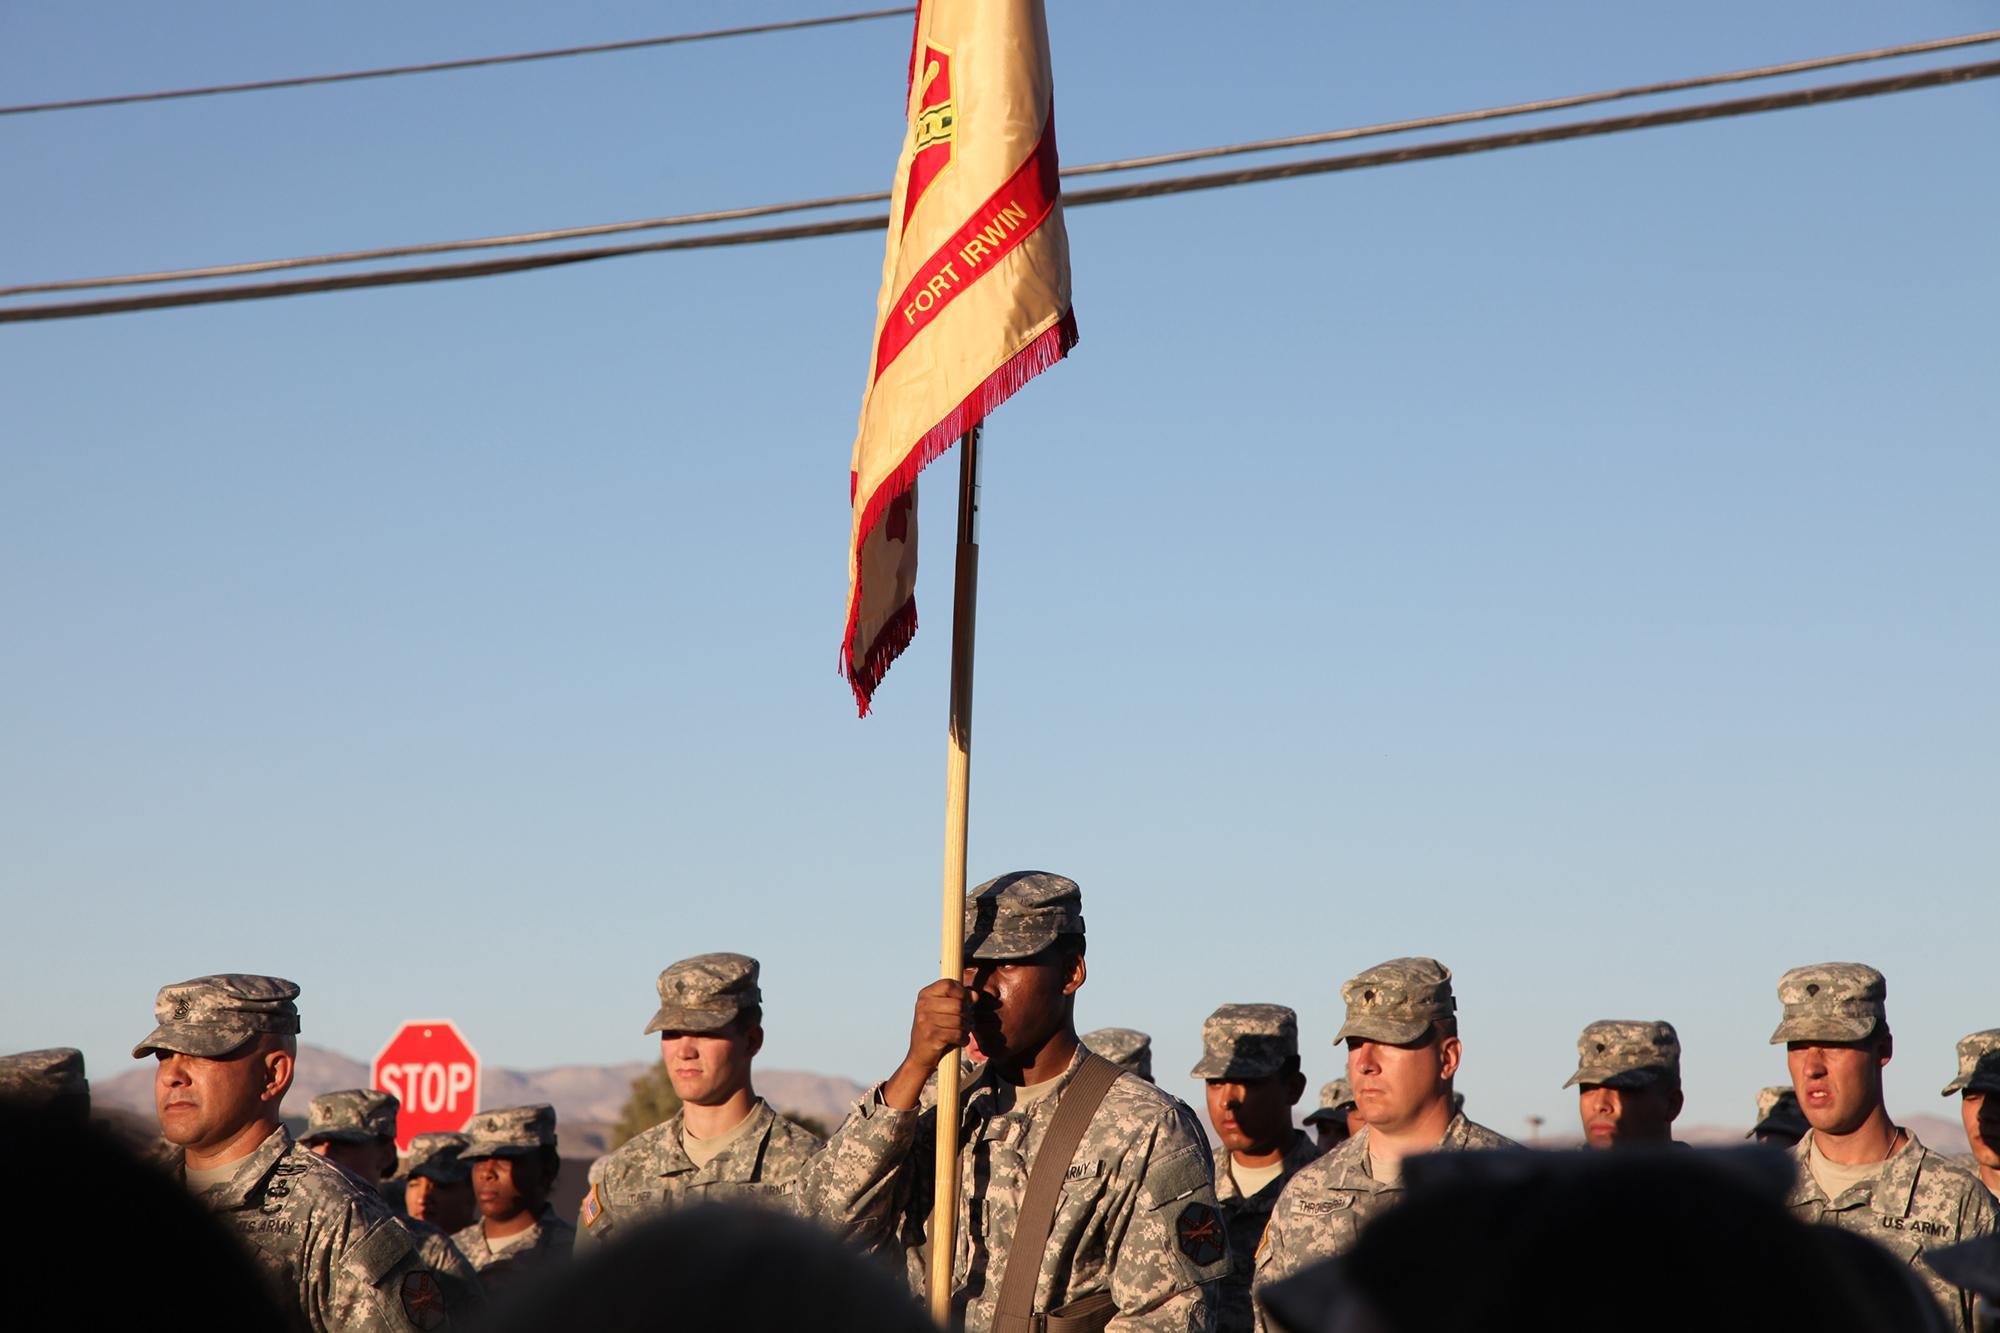 Change of command ceremony, Fort Irwin, CA